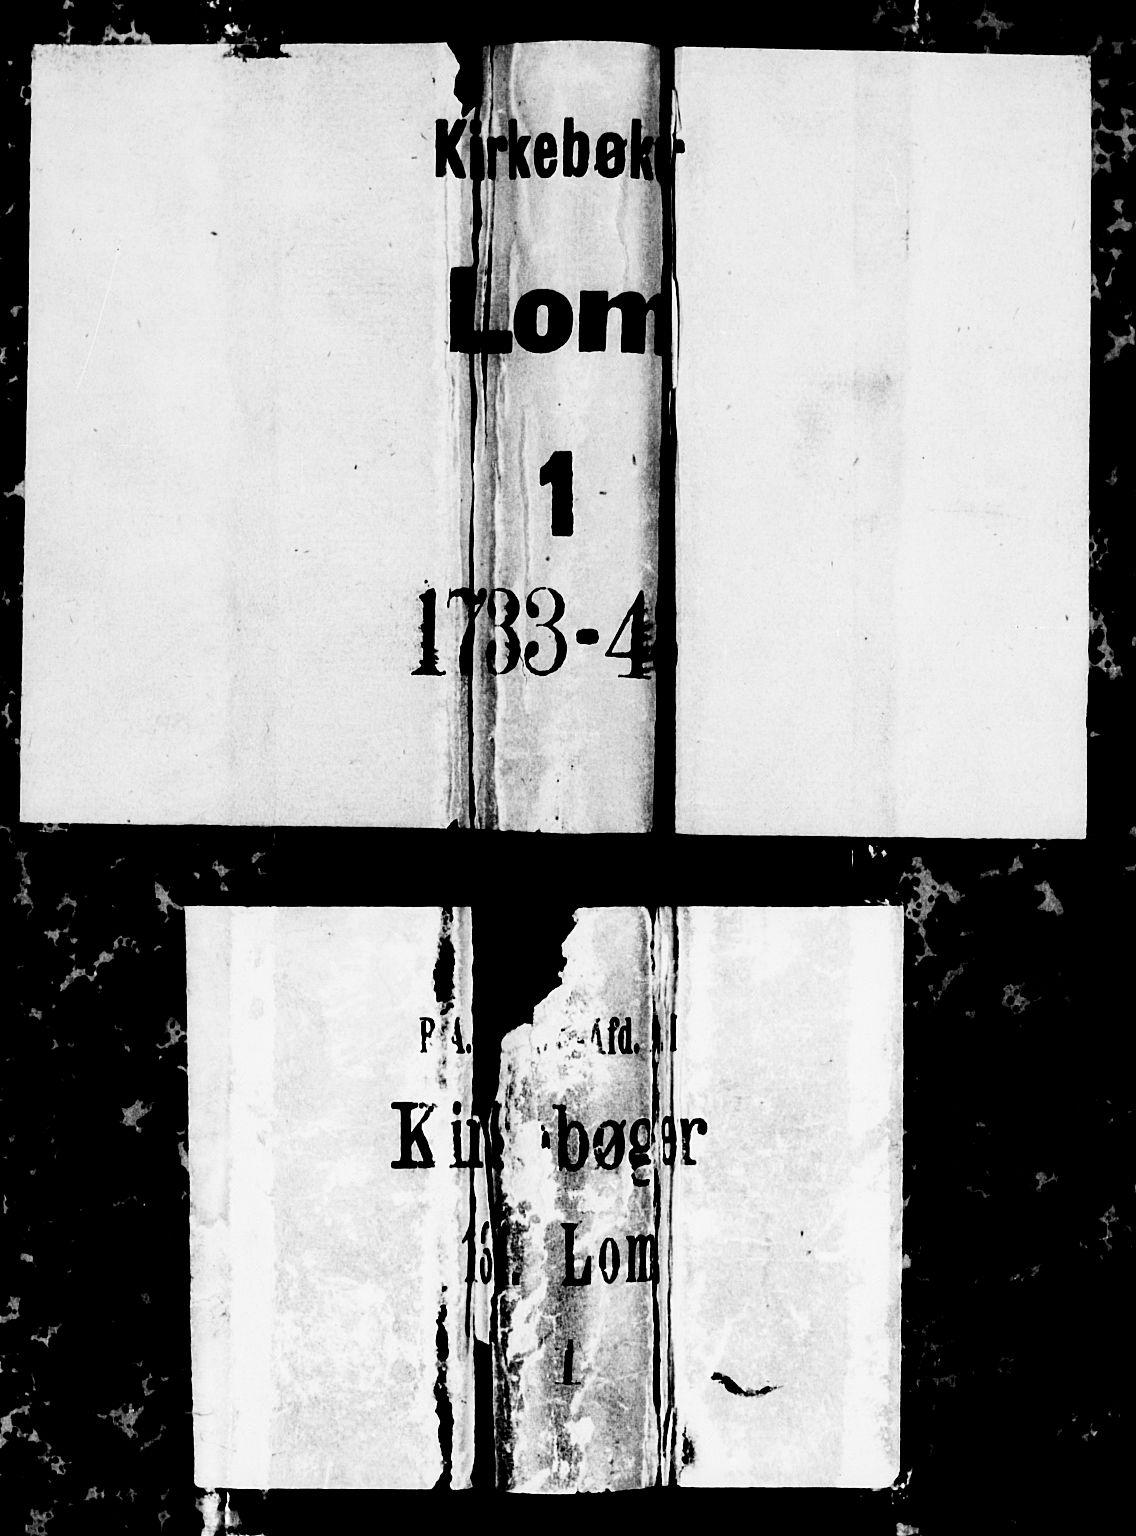 SAH, Lom prestekontor, K/L0001: Ministerialbok nr. 1, 1733-1748